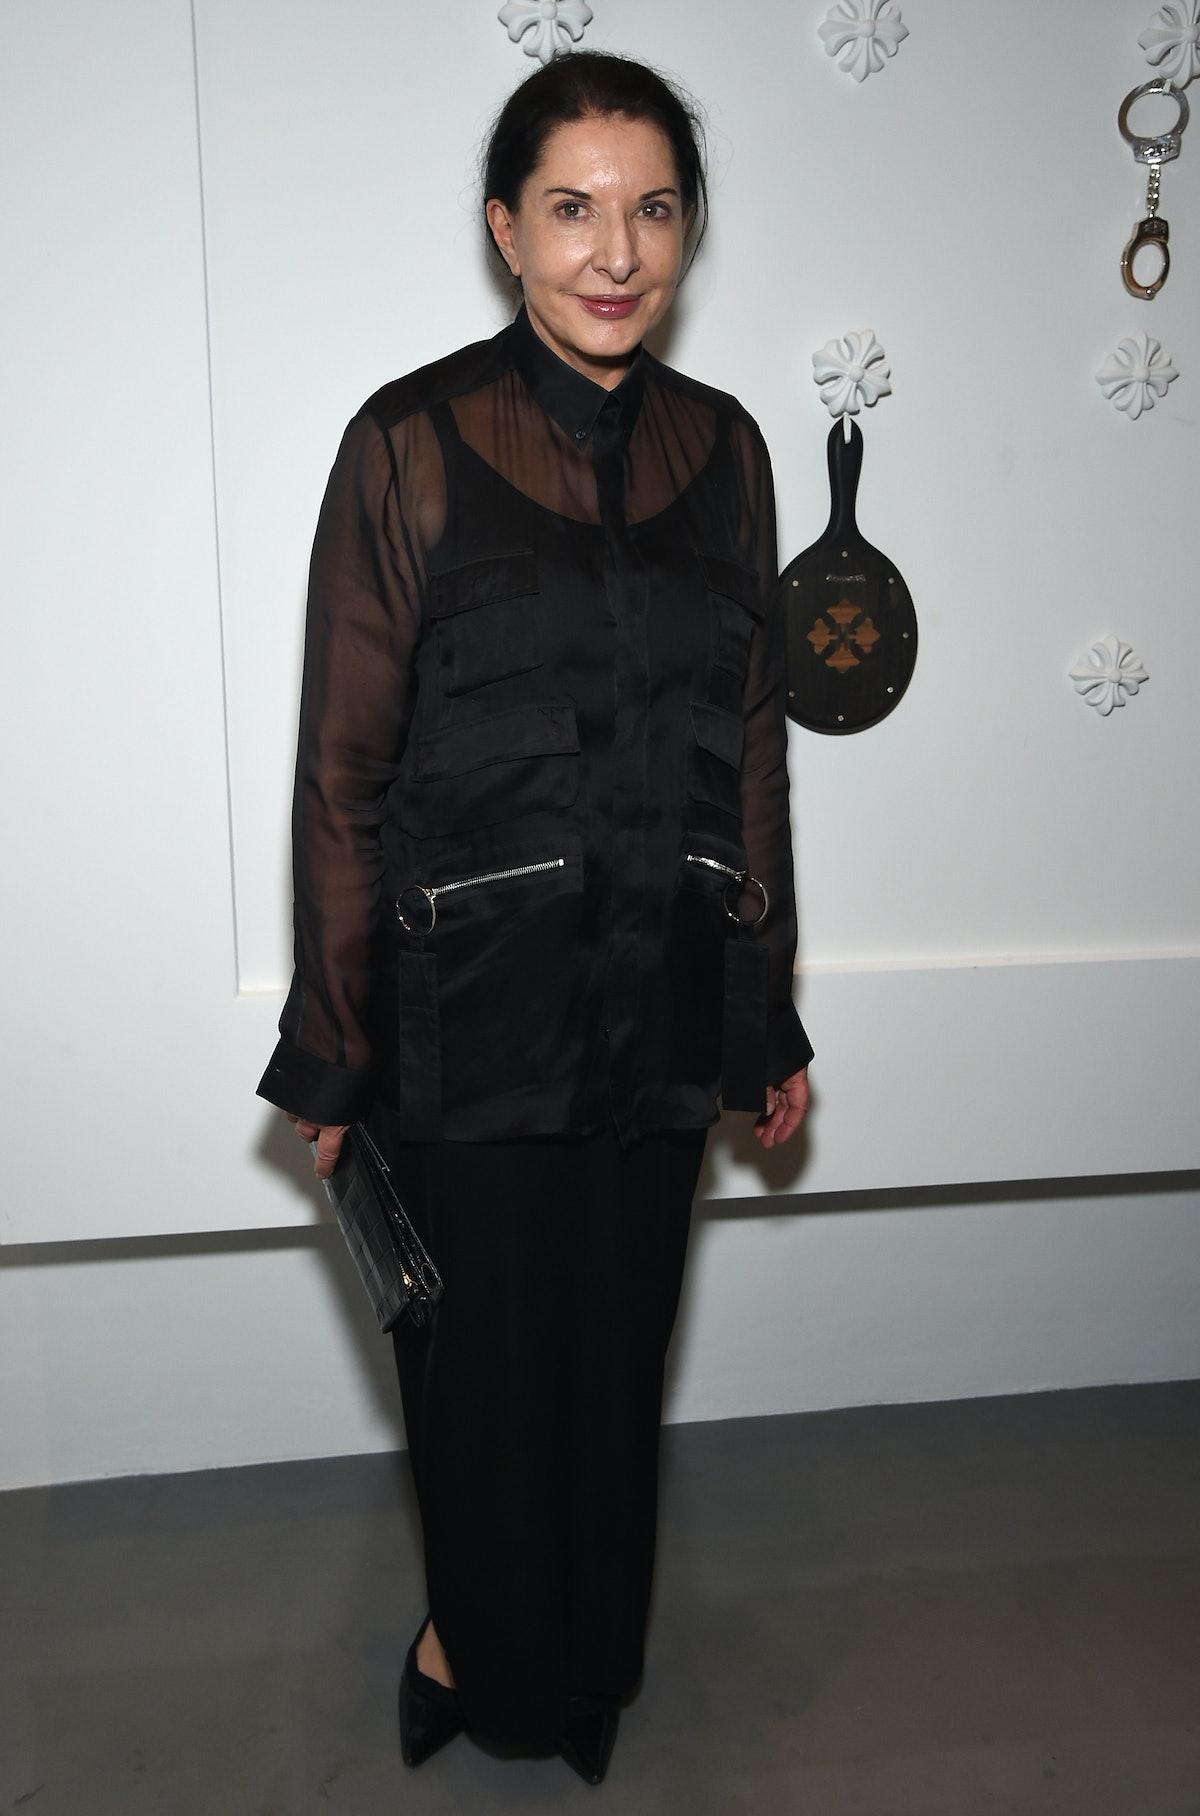 Marina Abramovic attends Chrome Hearts' celebration of The Miami Project